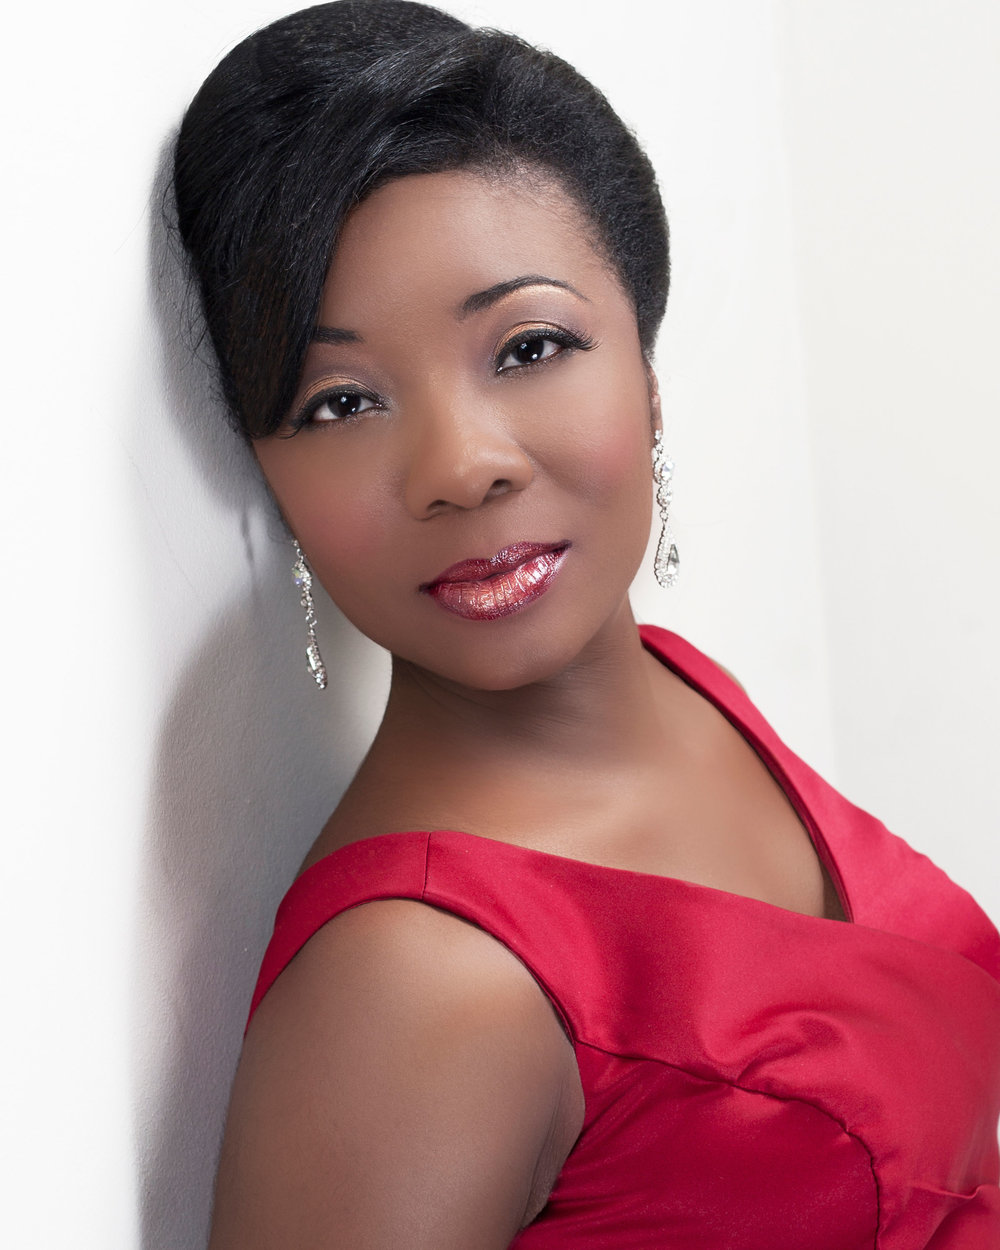 Adewale Akinnuoye-Agbaje (born 1967),Nicki Hunter Hot pictures Deborah Watling (born 1948),Leonora Corbett